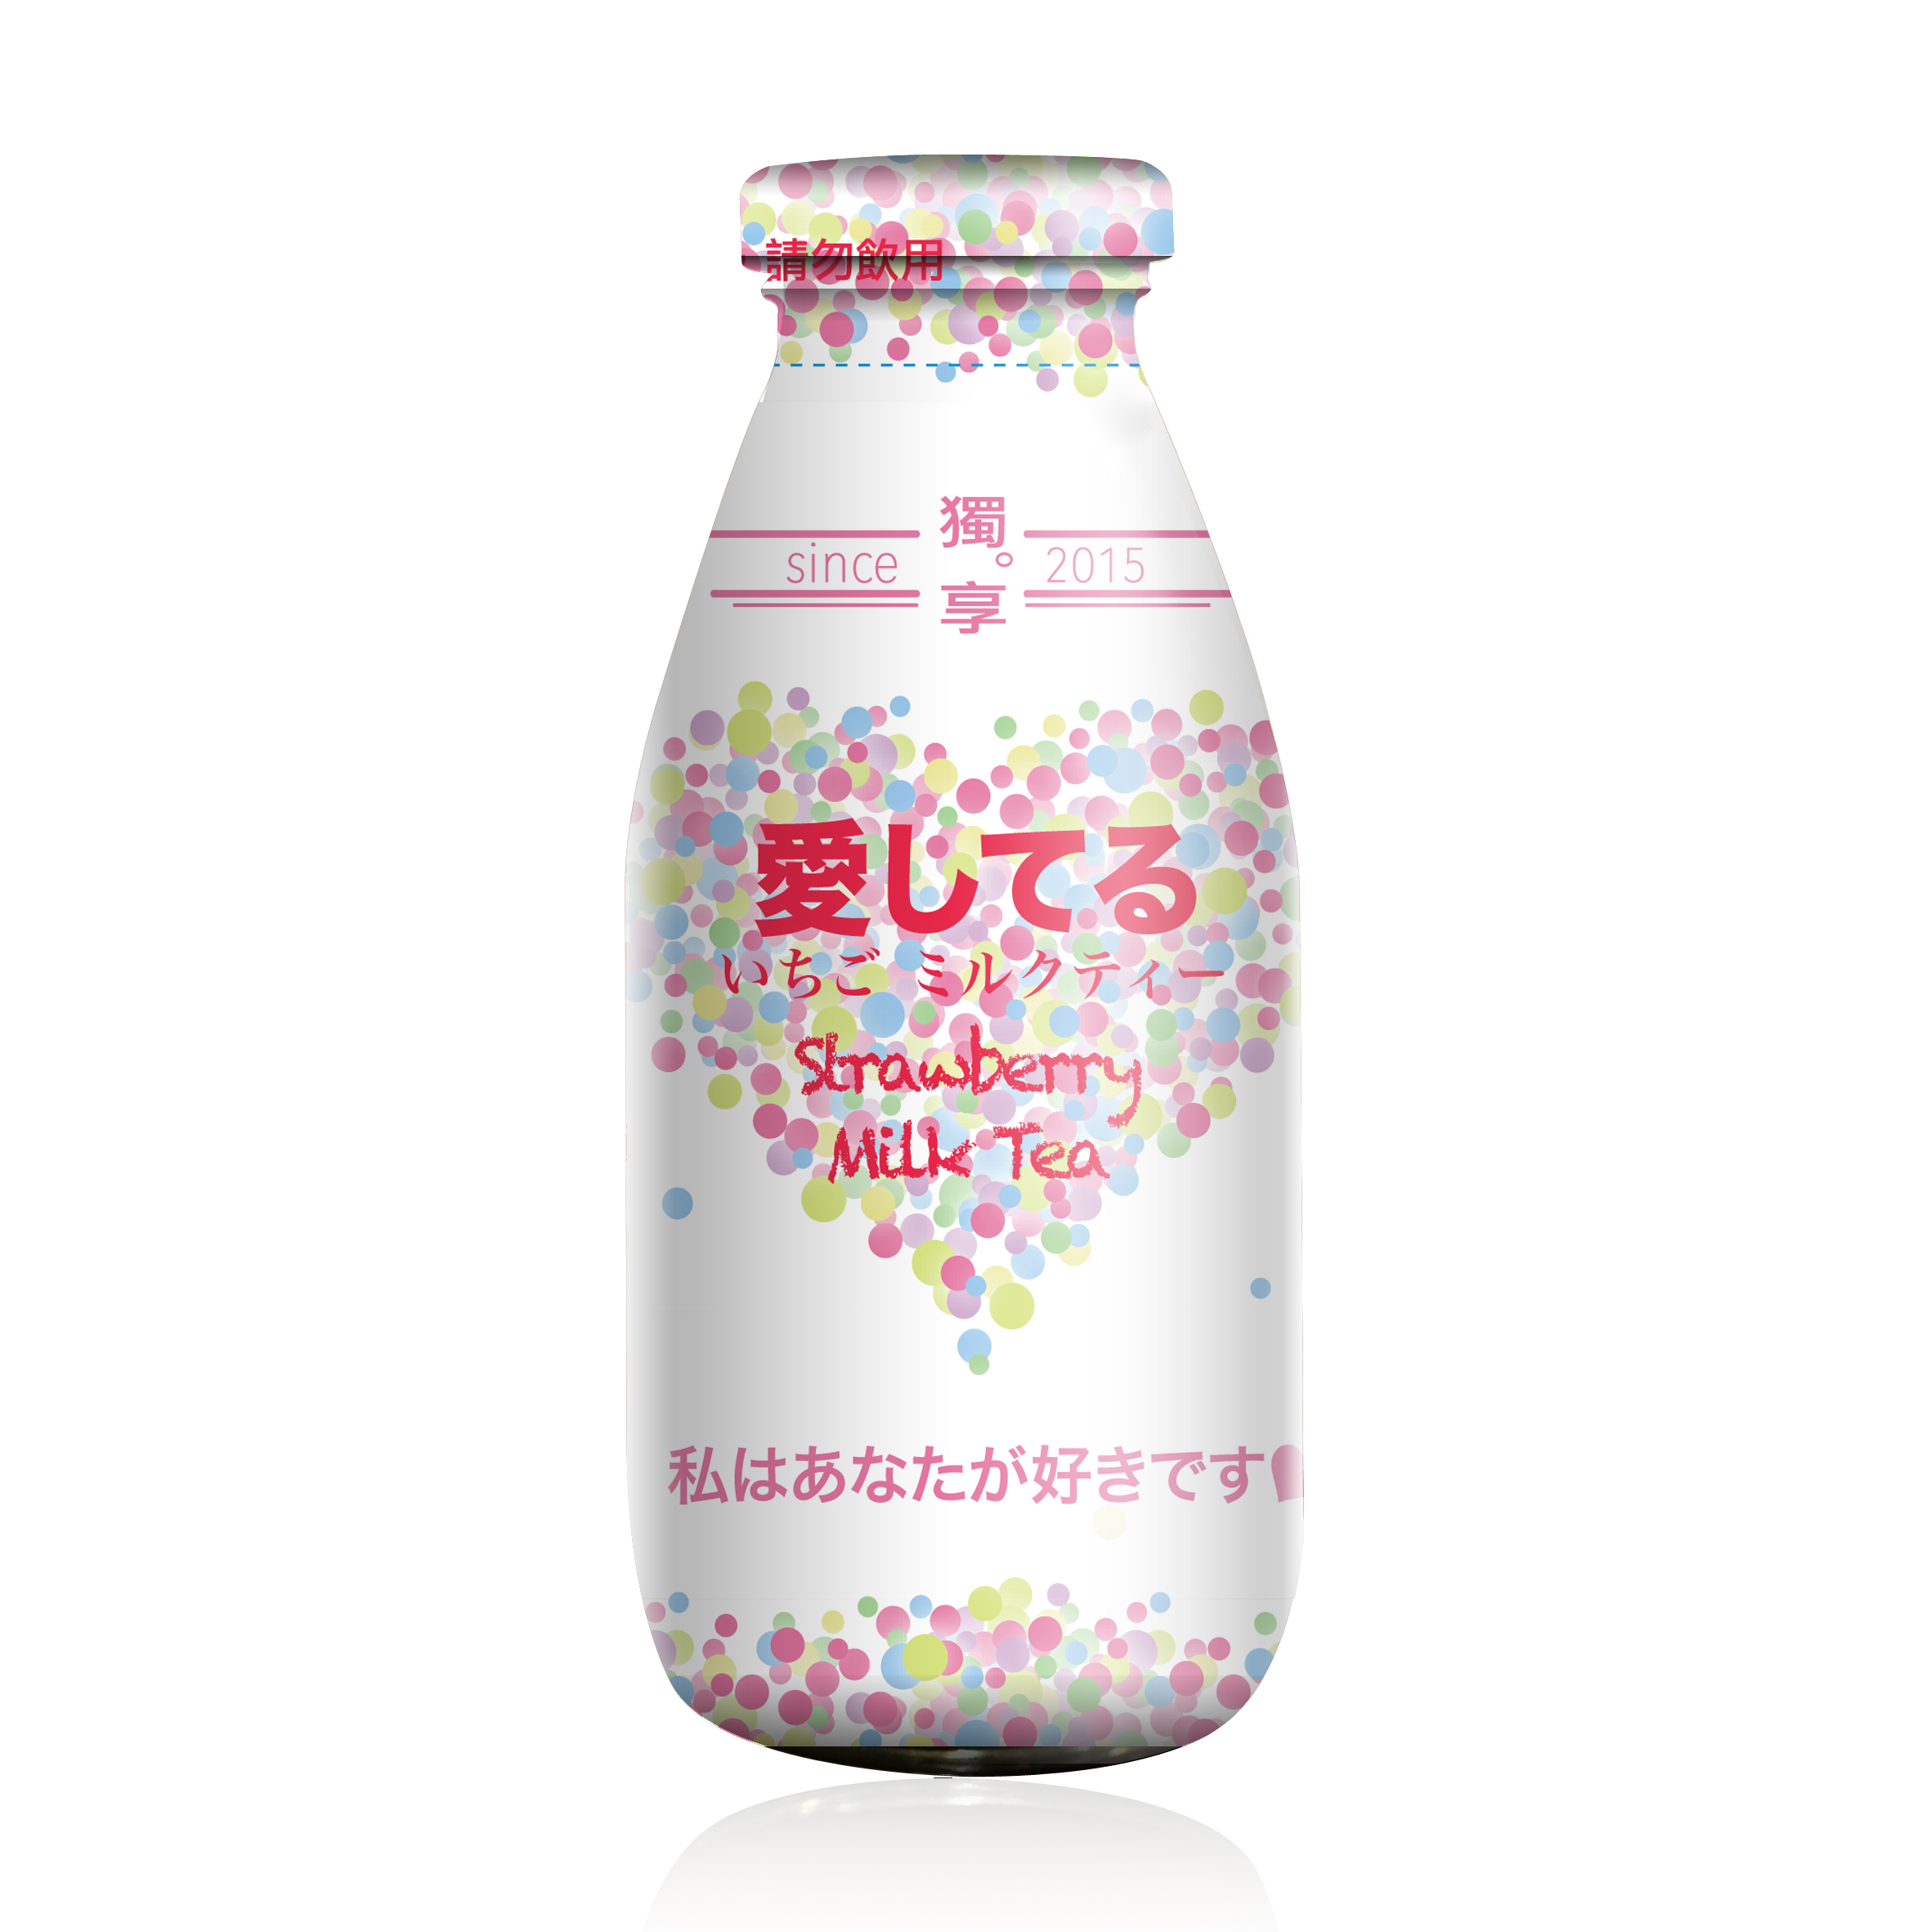 Trà sữa vị dâu tây - Strawberry milk tea